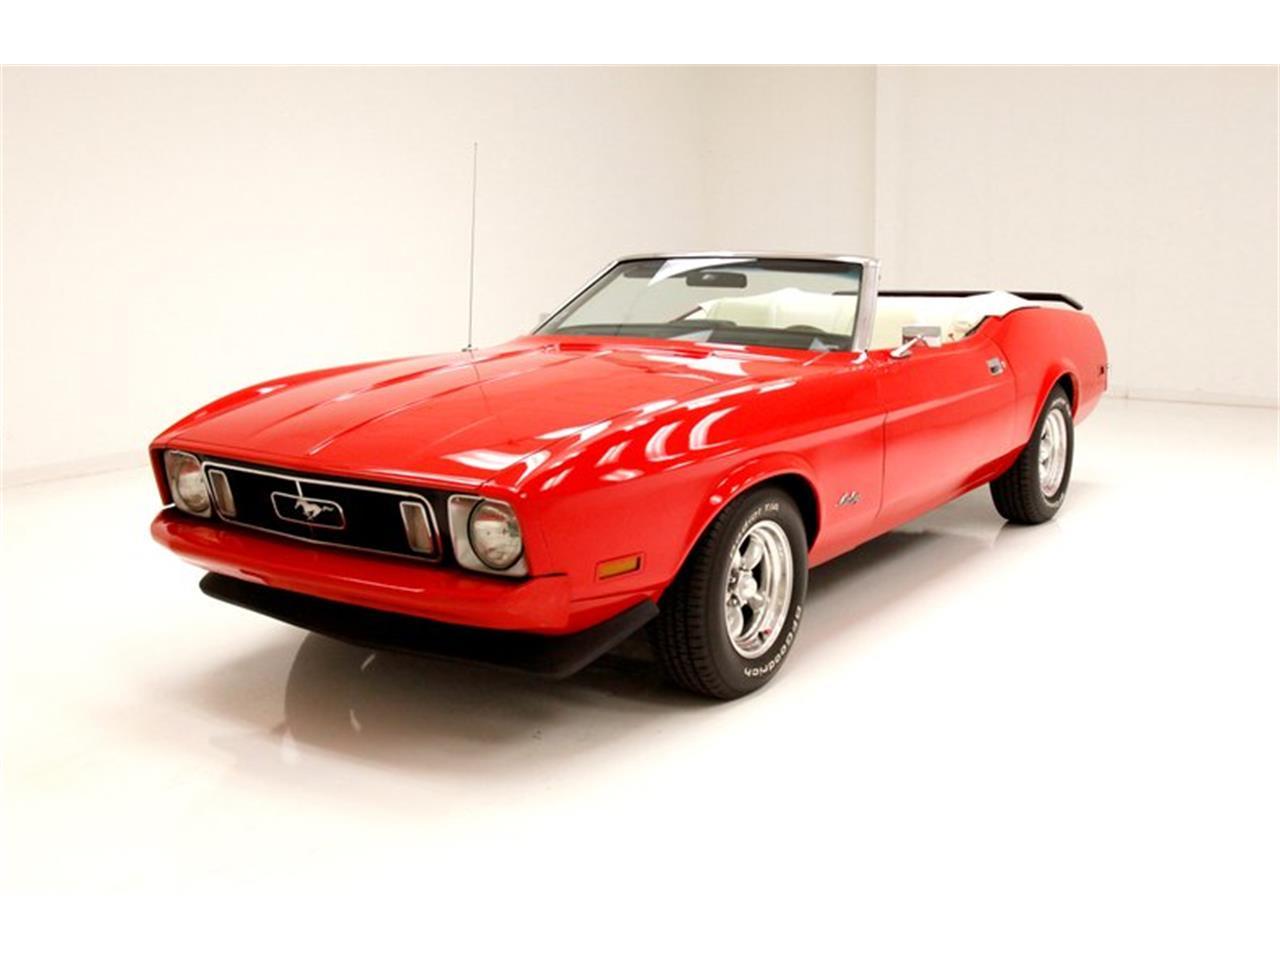 Ford Mustang 302 v8 1973 prix tout compris 1973